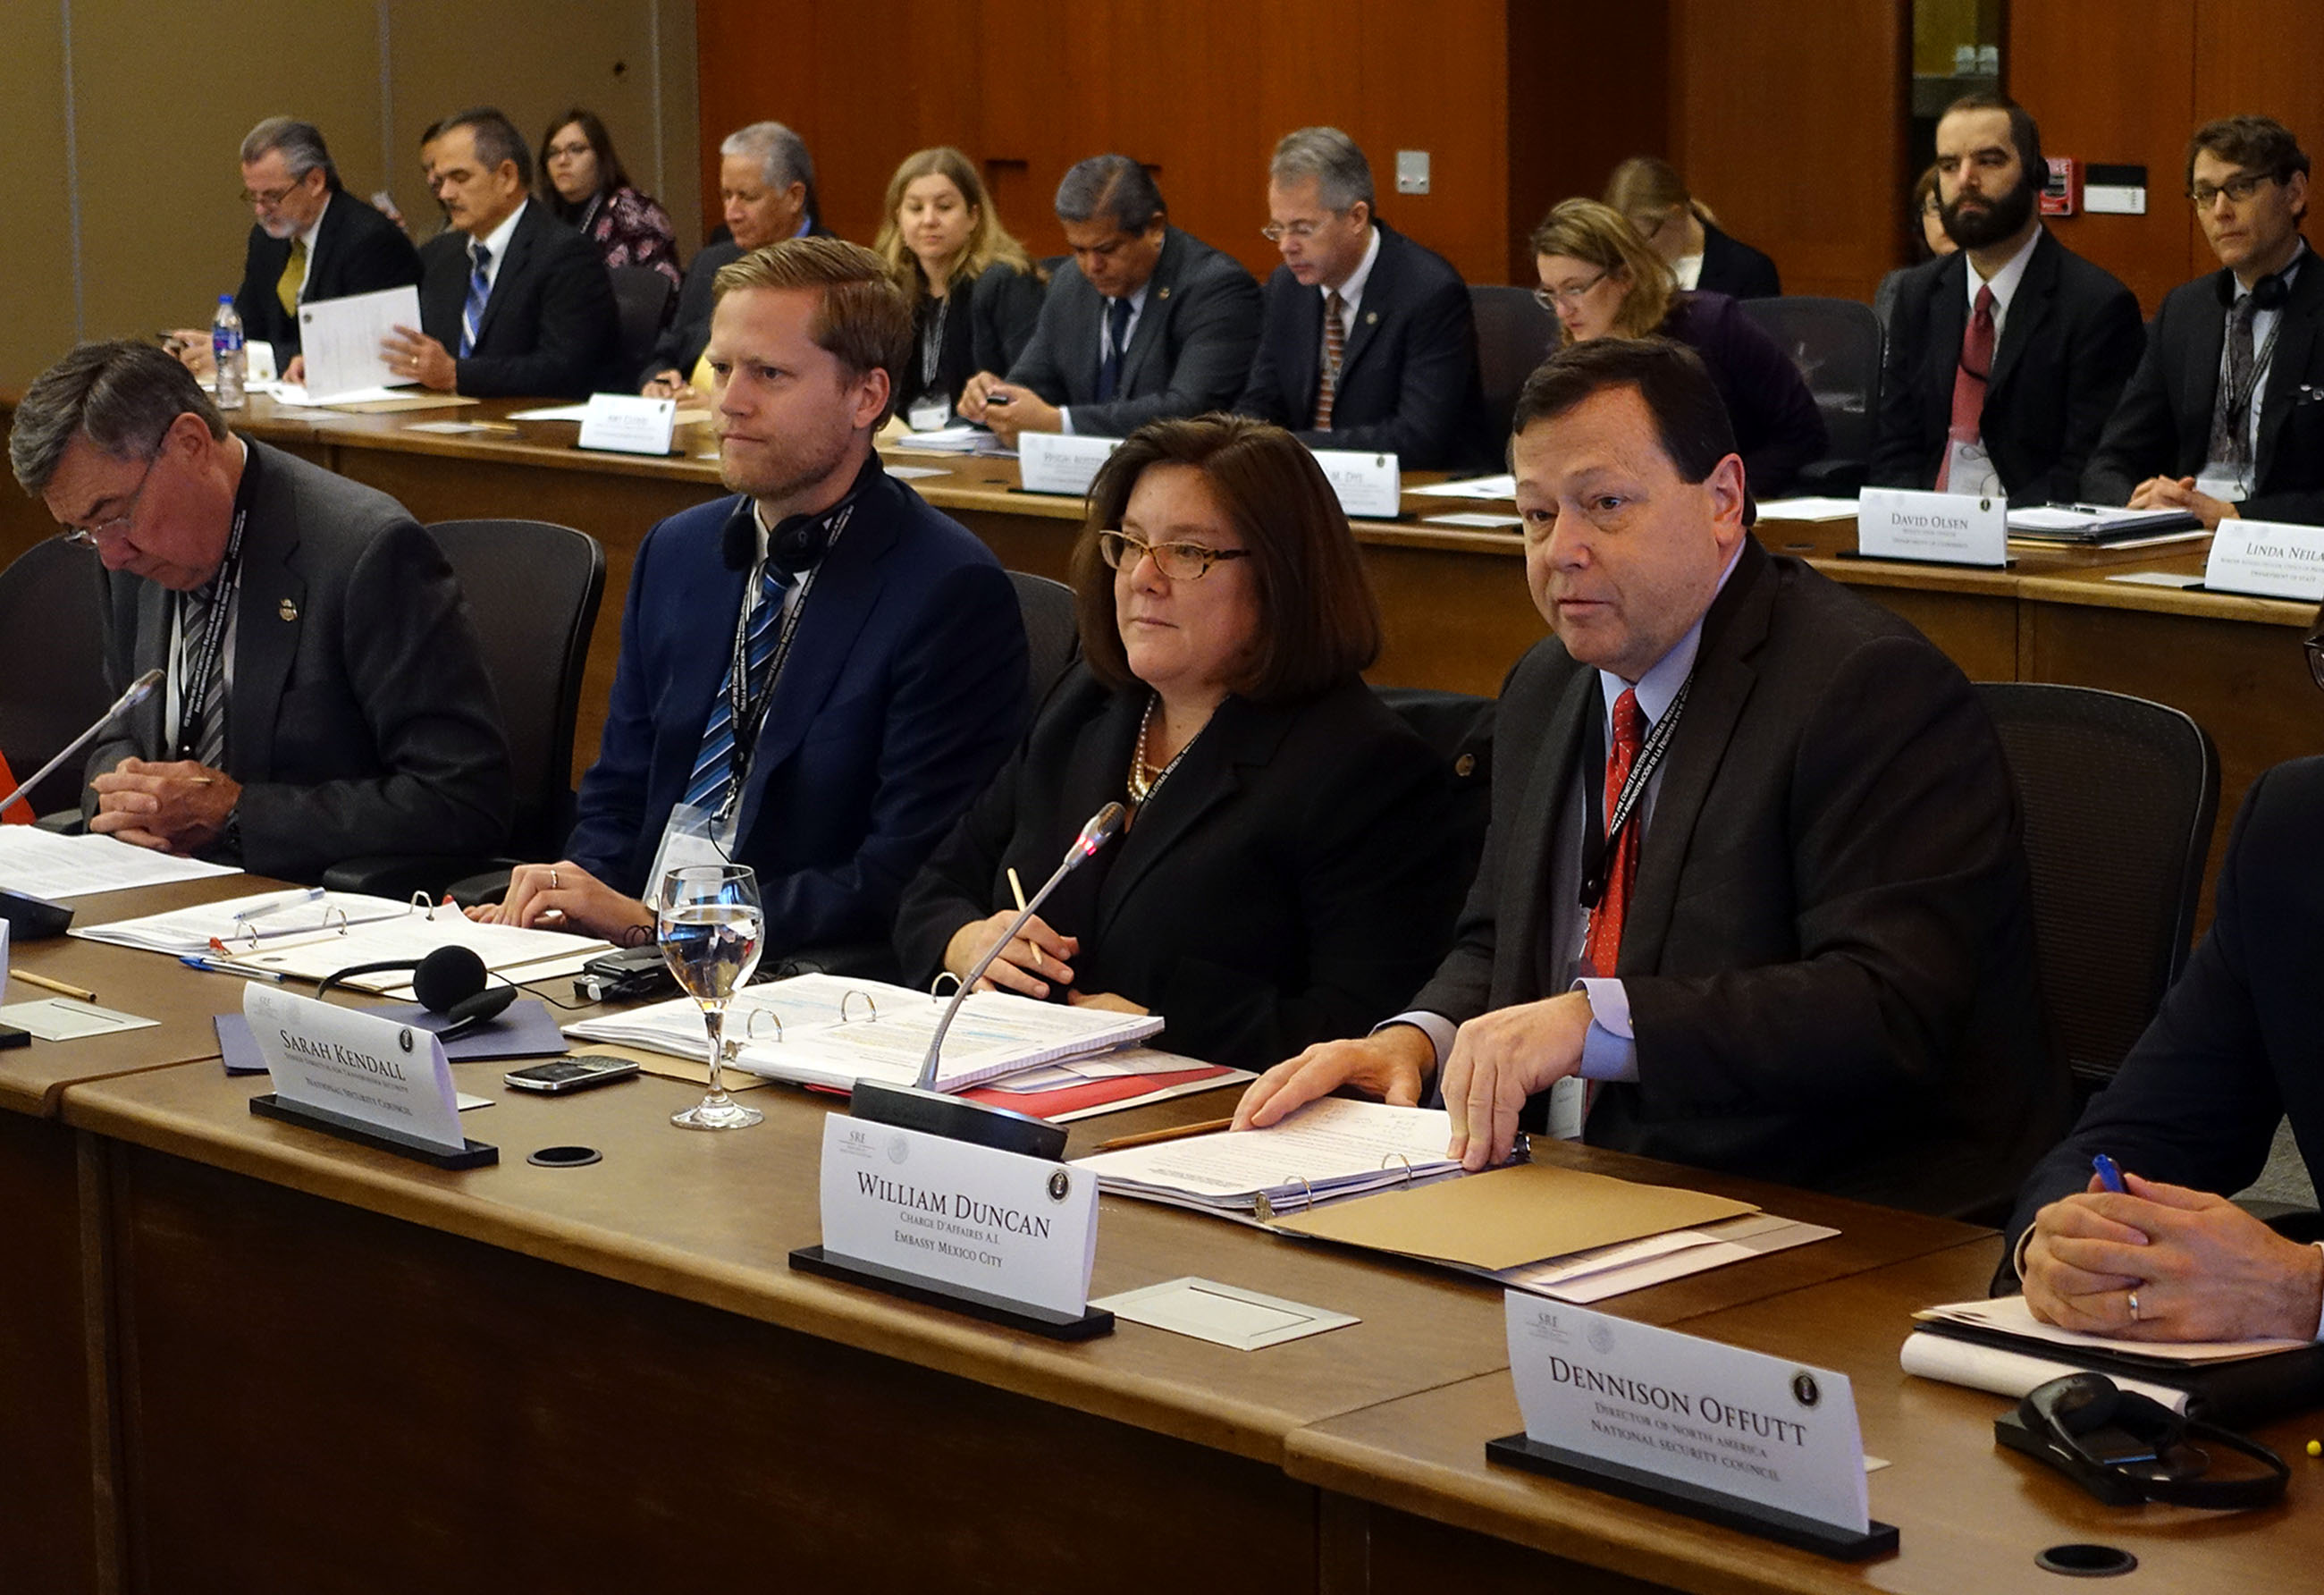 FOTO 3 Reuni n del Comit  Ejecutivo Bilateral de la Iniciativa para la Administraci n de la Frontera en el Siglo XXIjpg